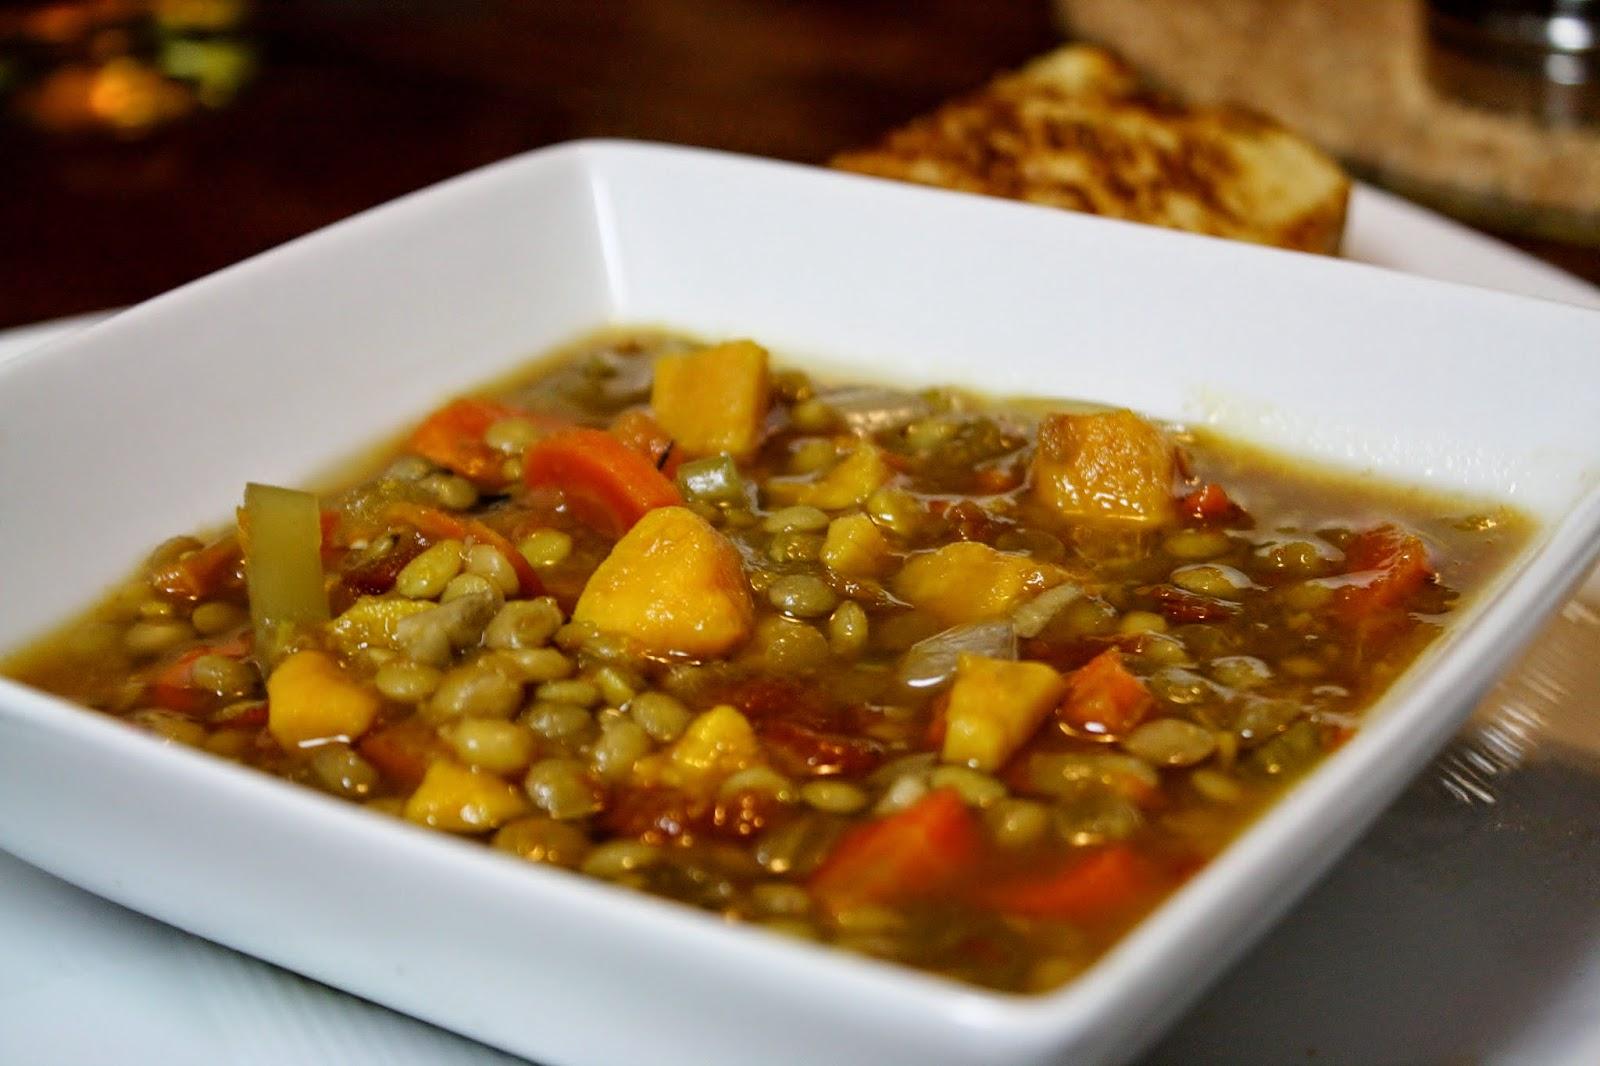 http://eatprayjuice.blogspot.com/2015/02/crock-pot-sweet-potato-lentil-soup.html